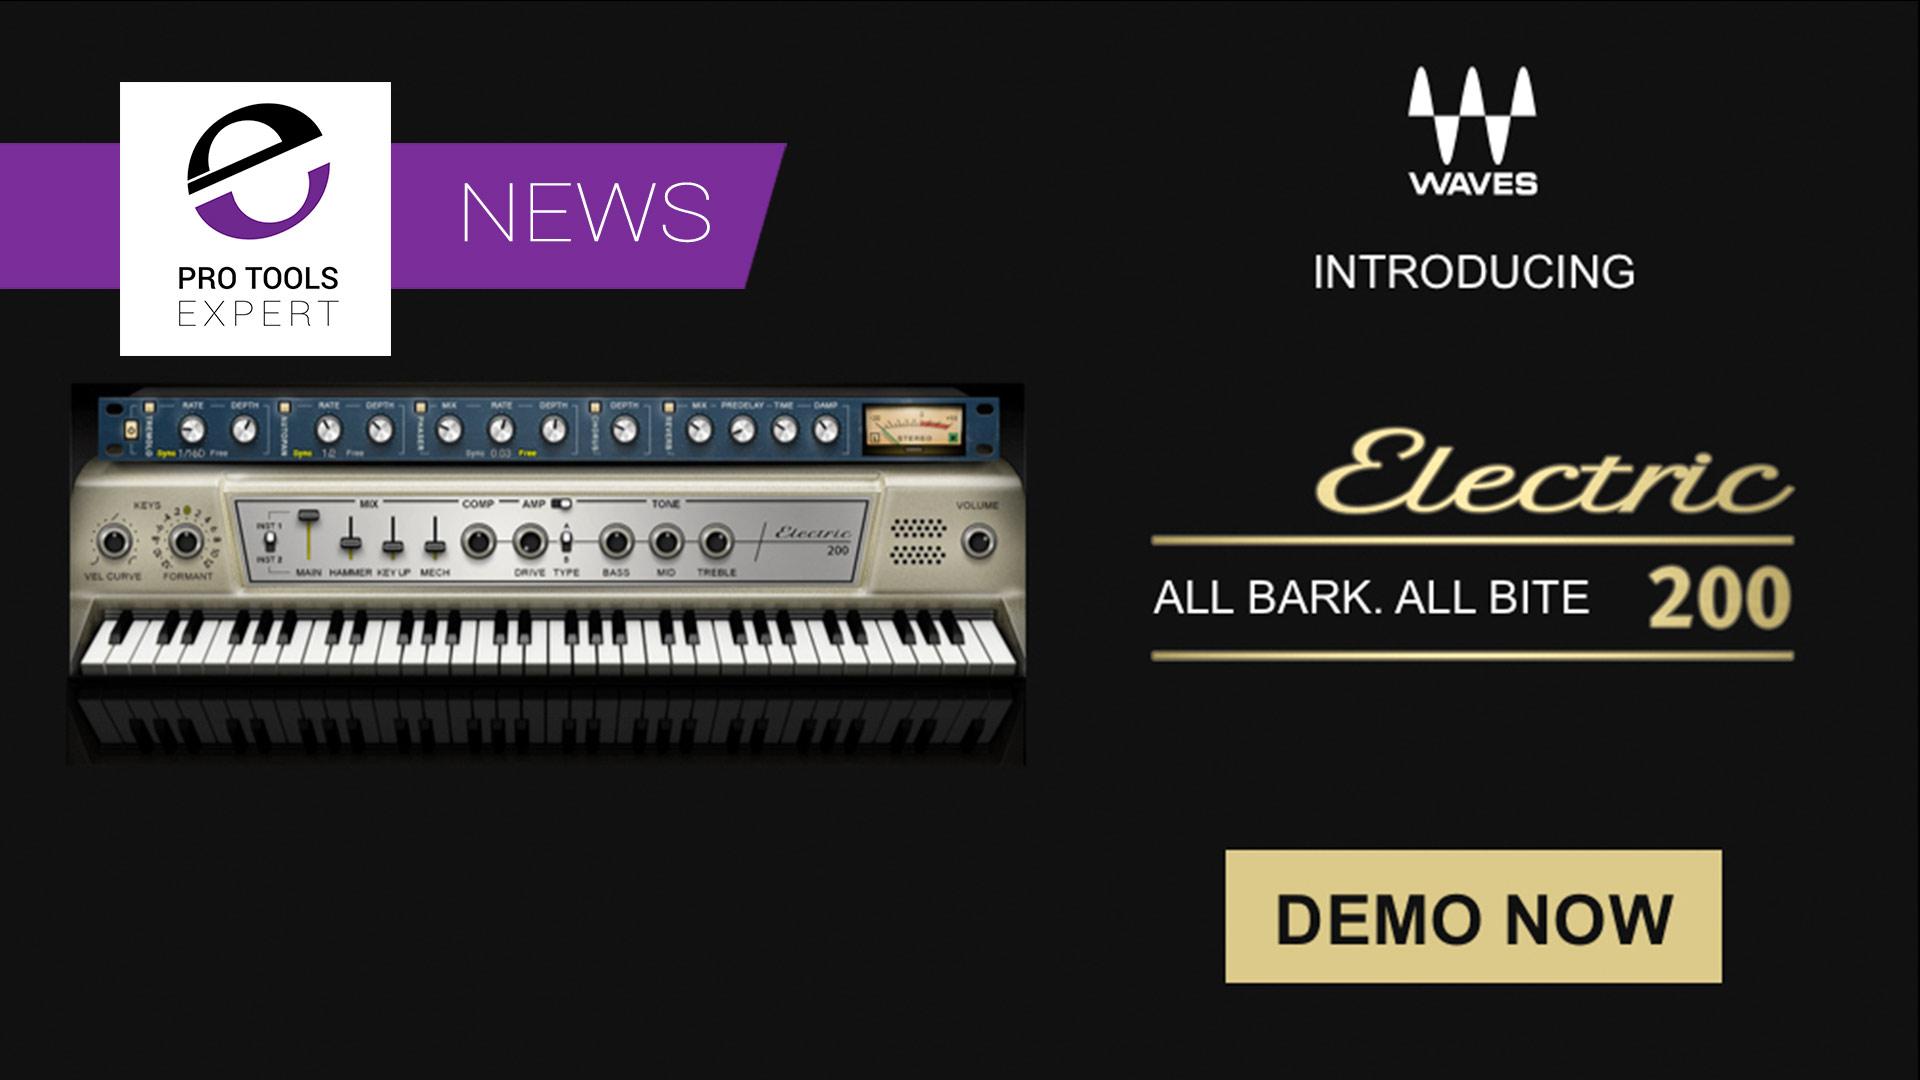 waves-electric-piano-200-virtual-instrument-news.jpg